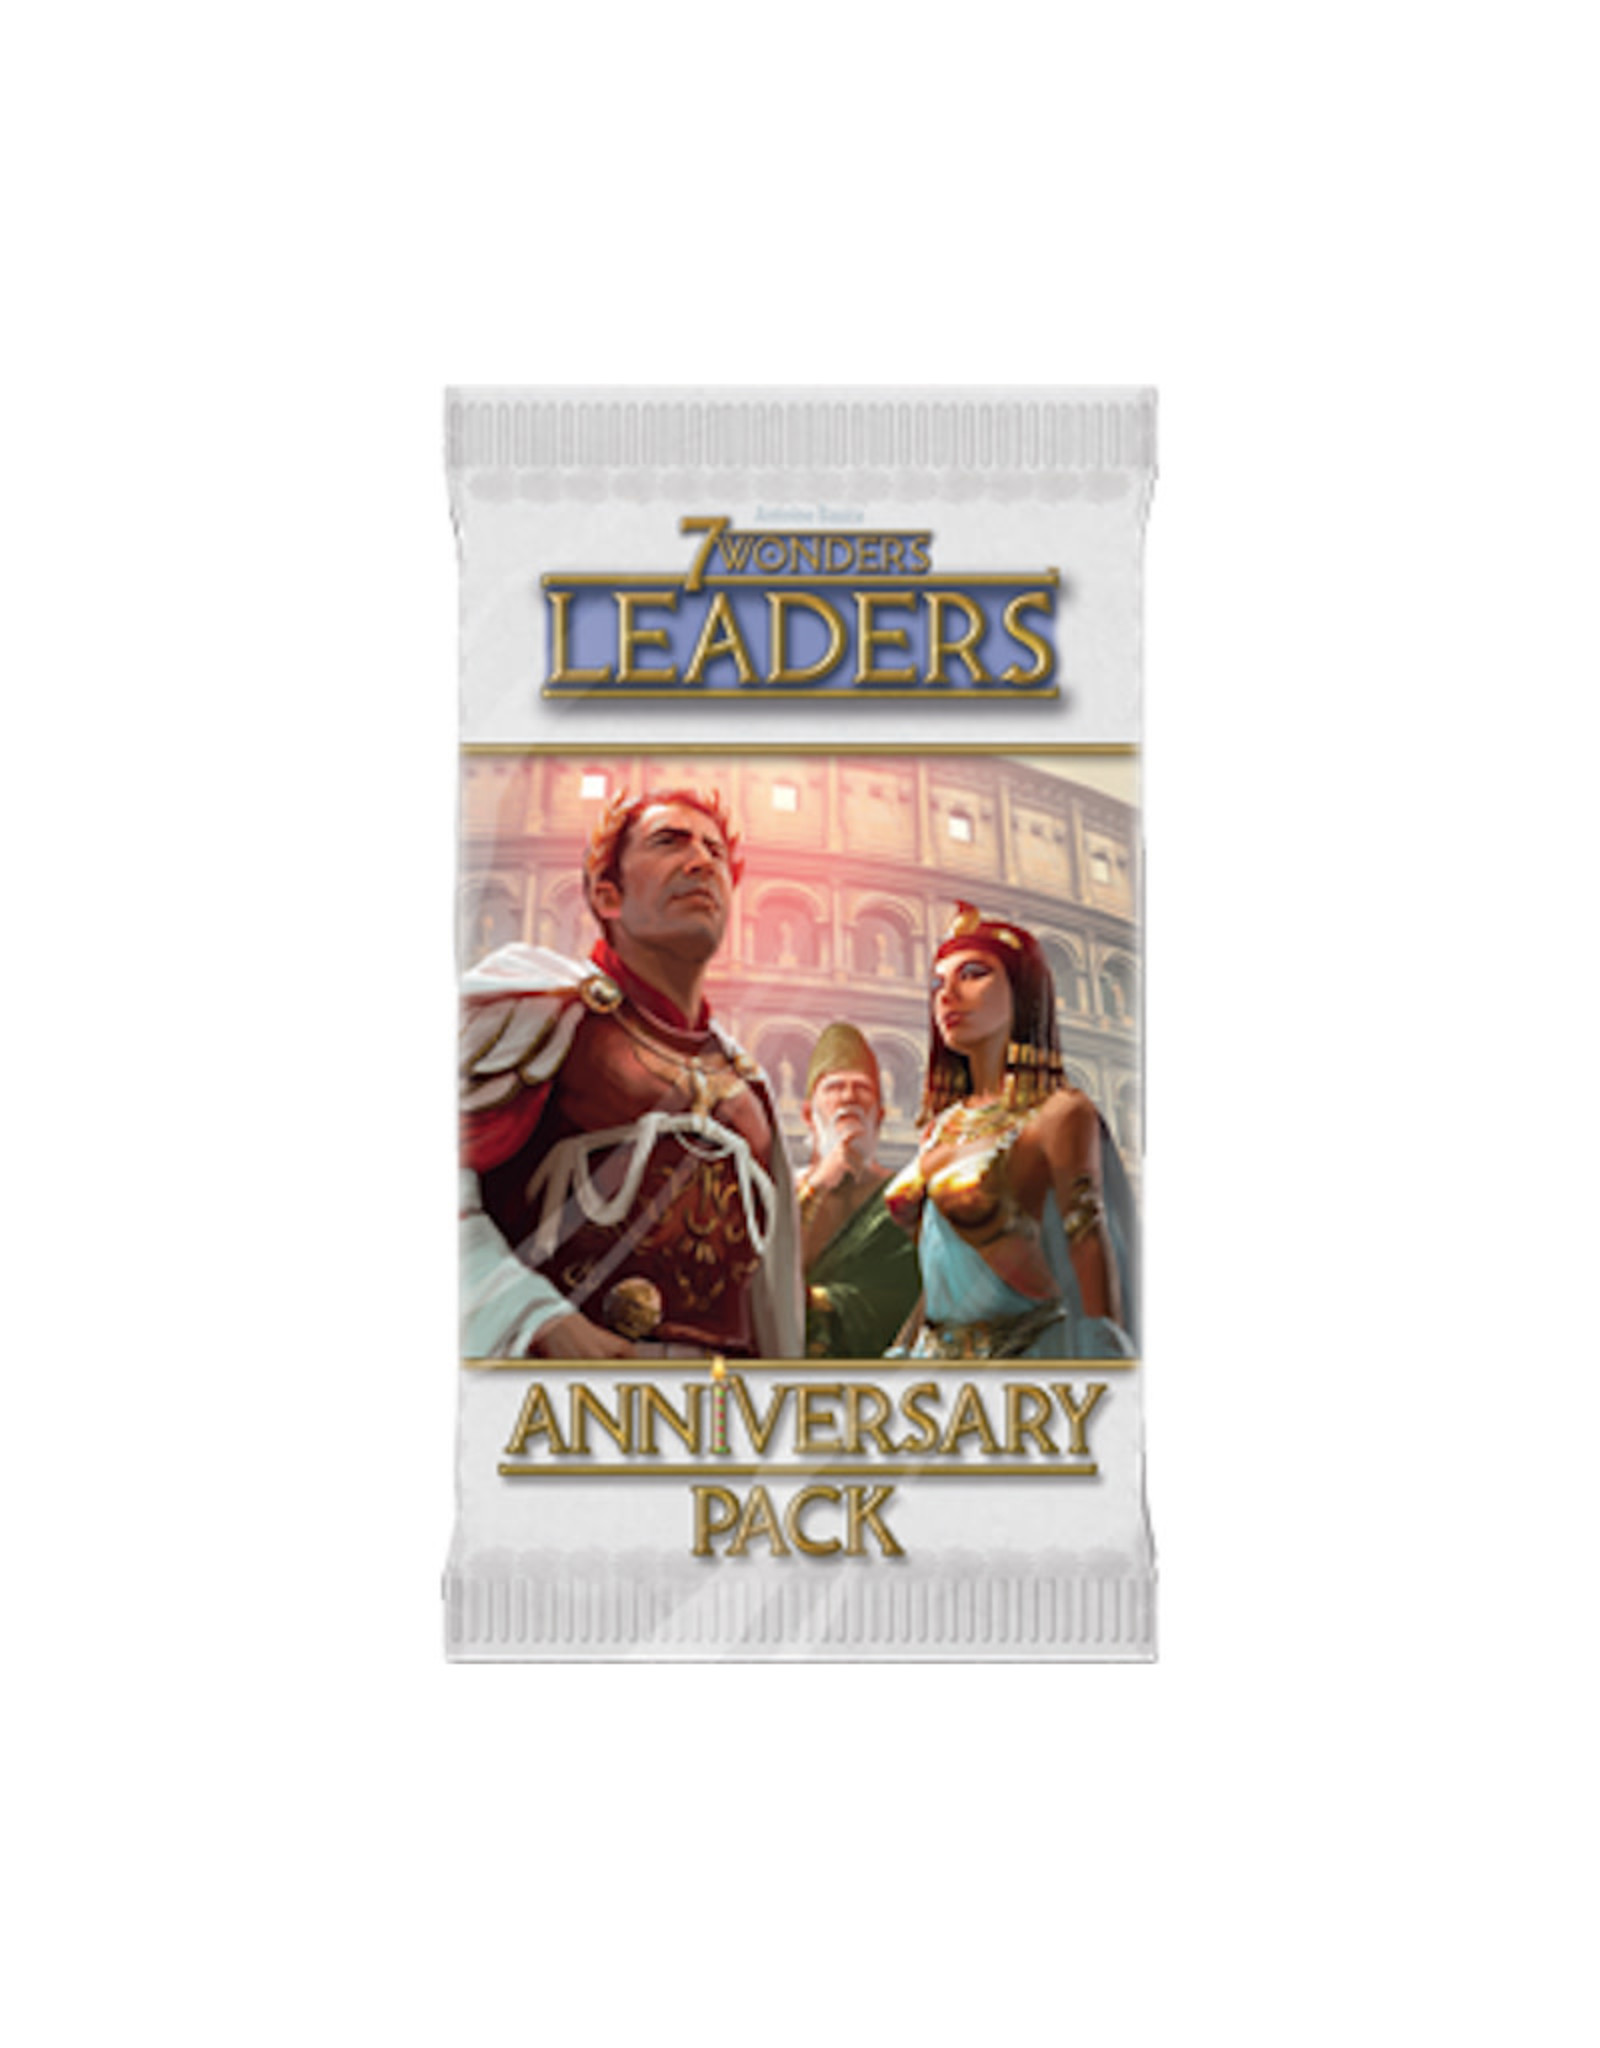 7 Wonders Leaders Anniversary Pack Expansion